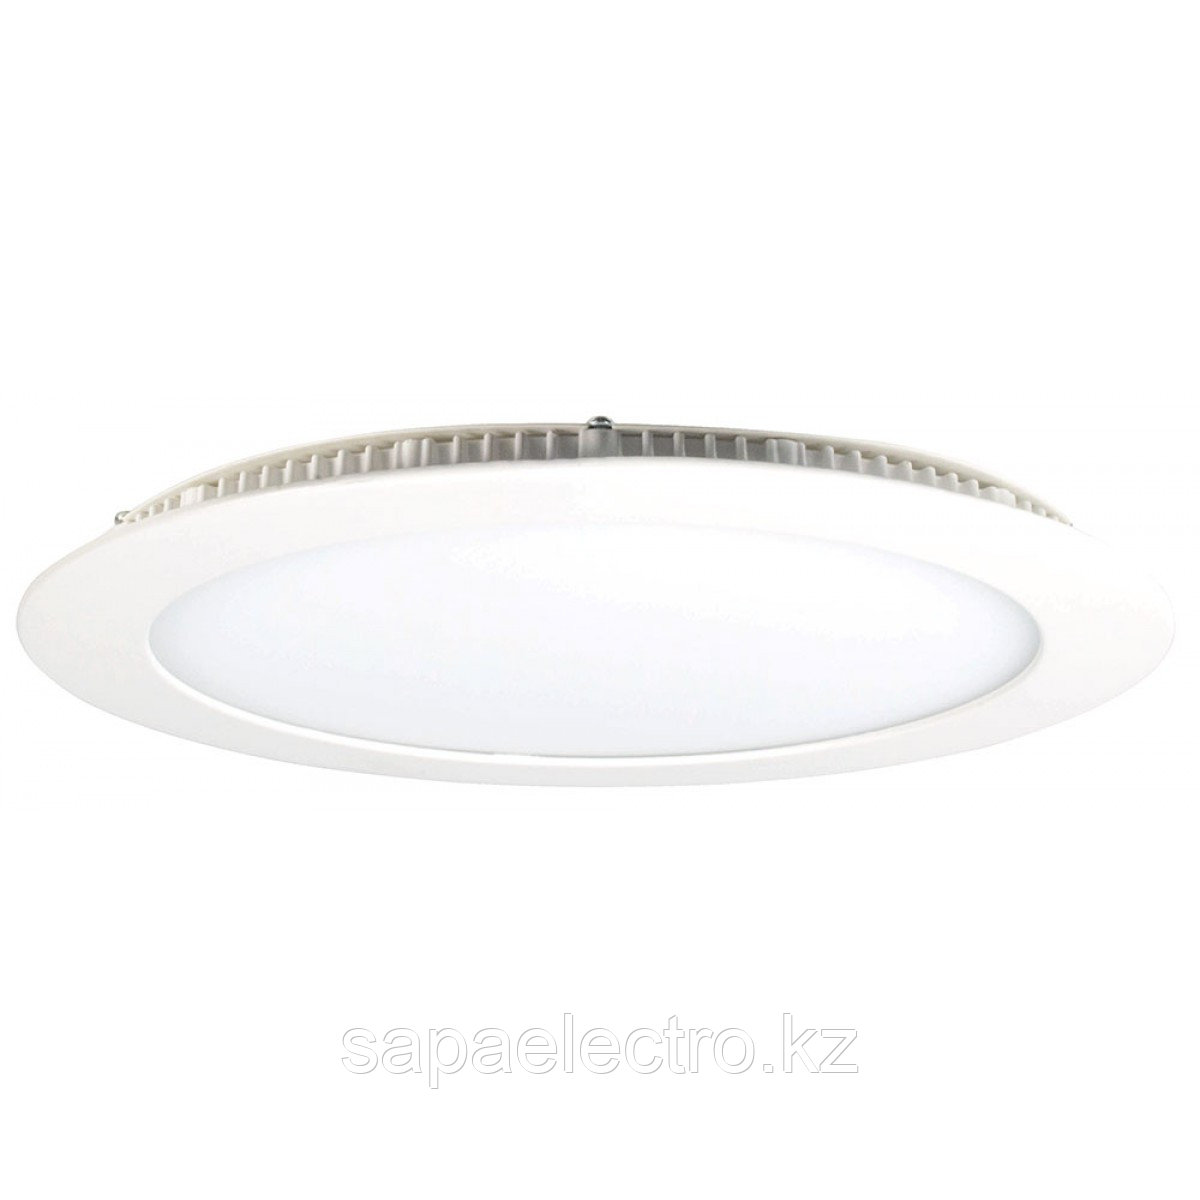 Свет-к DL LED ROUND PANEL 18W 3000K (TS) 20шт